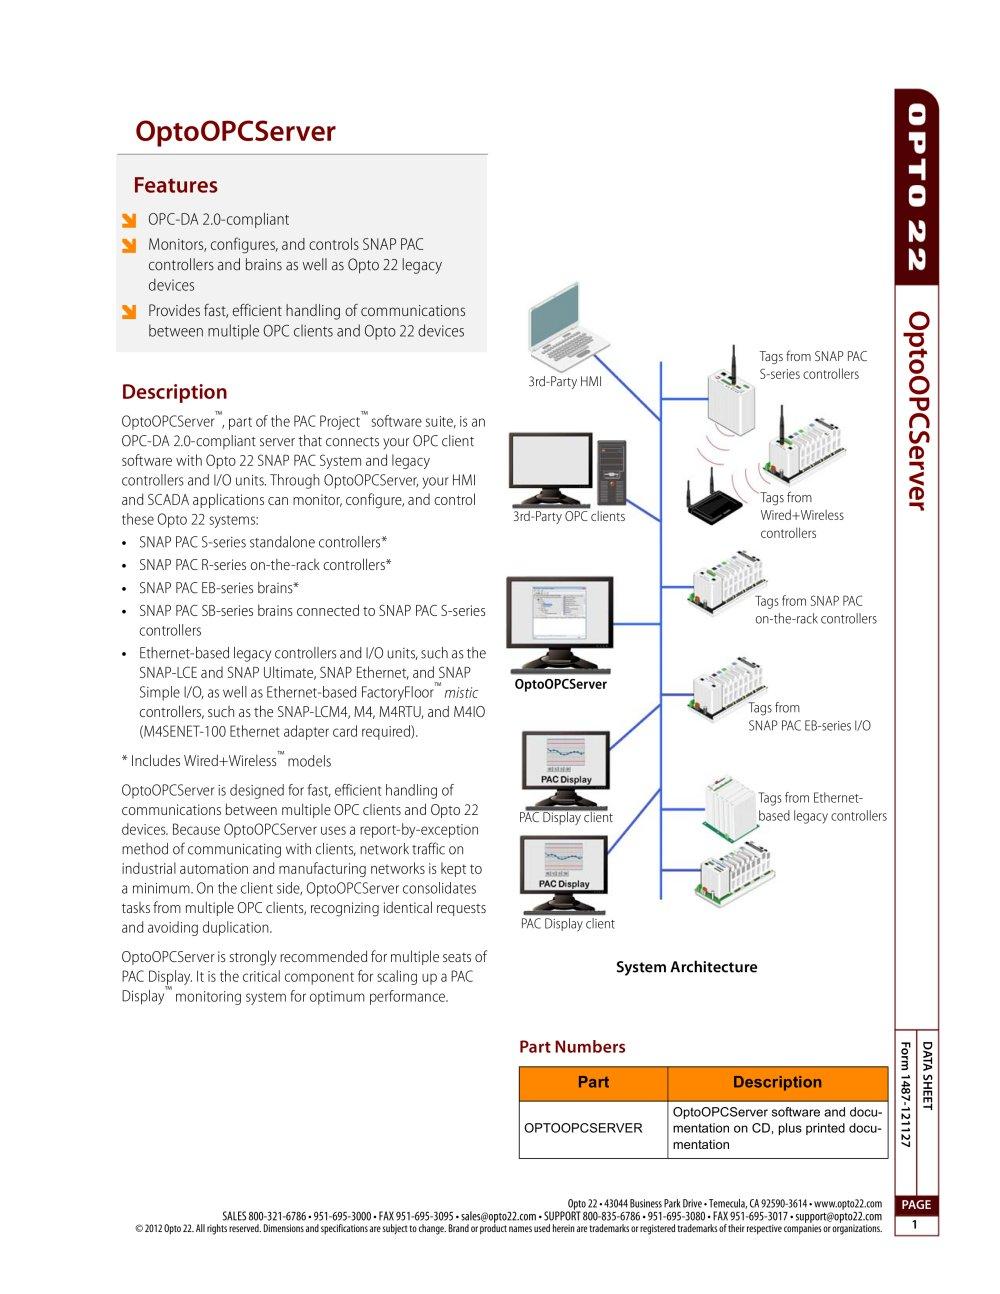 [DIAGRAM_38ZD]  F3F523 Opto 22 Ssr Wiring Diagram | Wiring Library | Opto 22 Ssr Wiring Diagram |  | Wiring Library